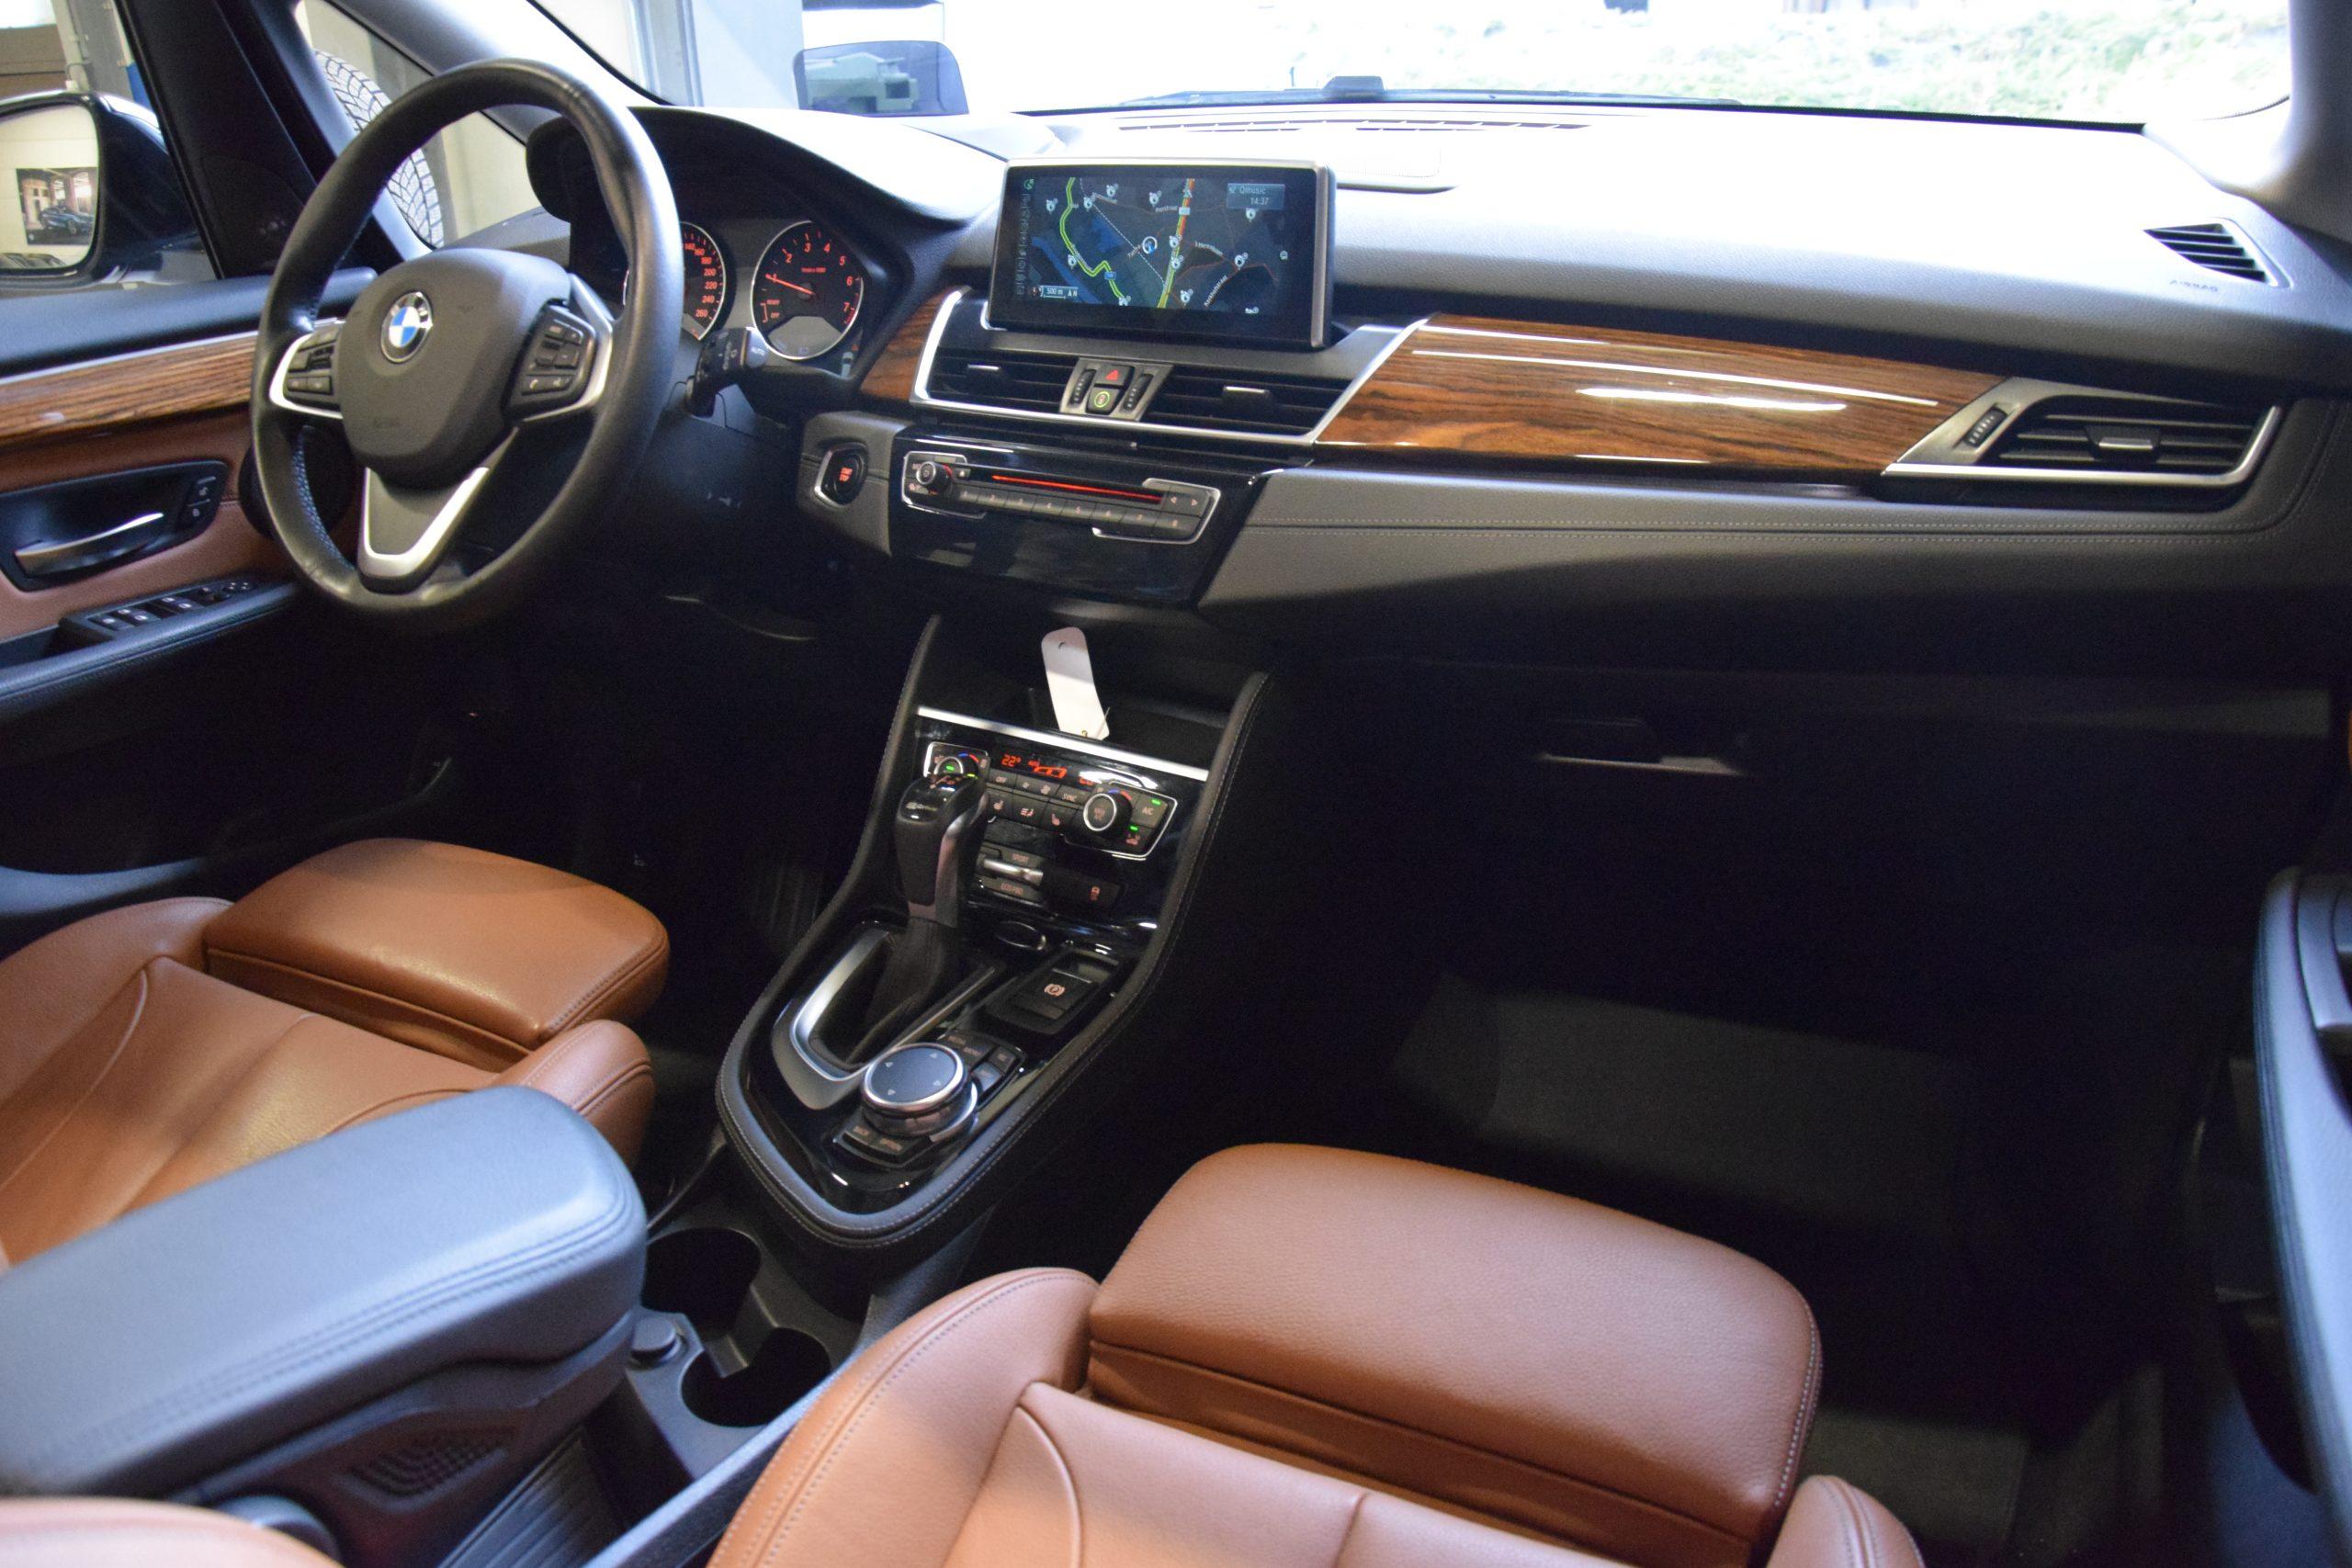 BMW 2250 Xe Active Tourer Plug-In Hybride – Full Option!!